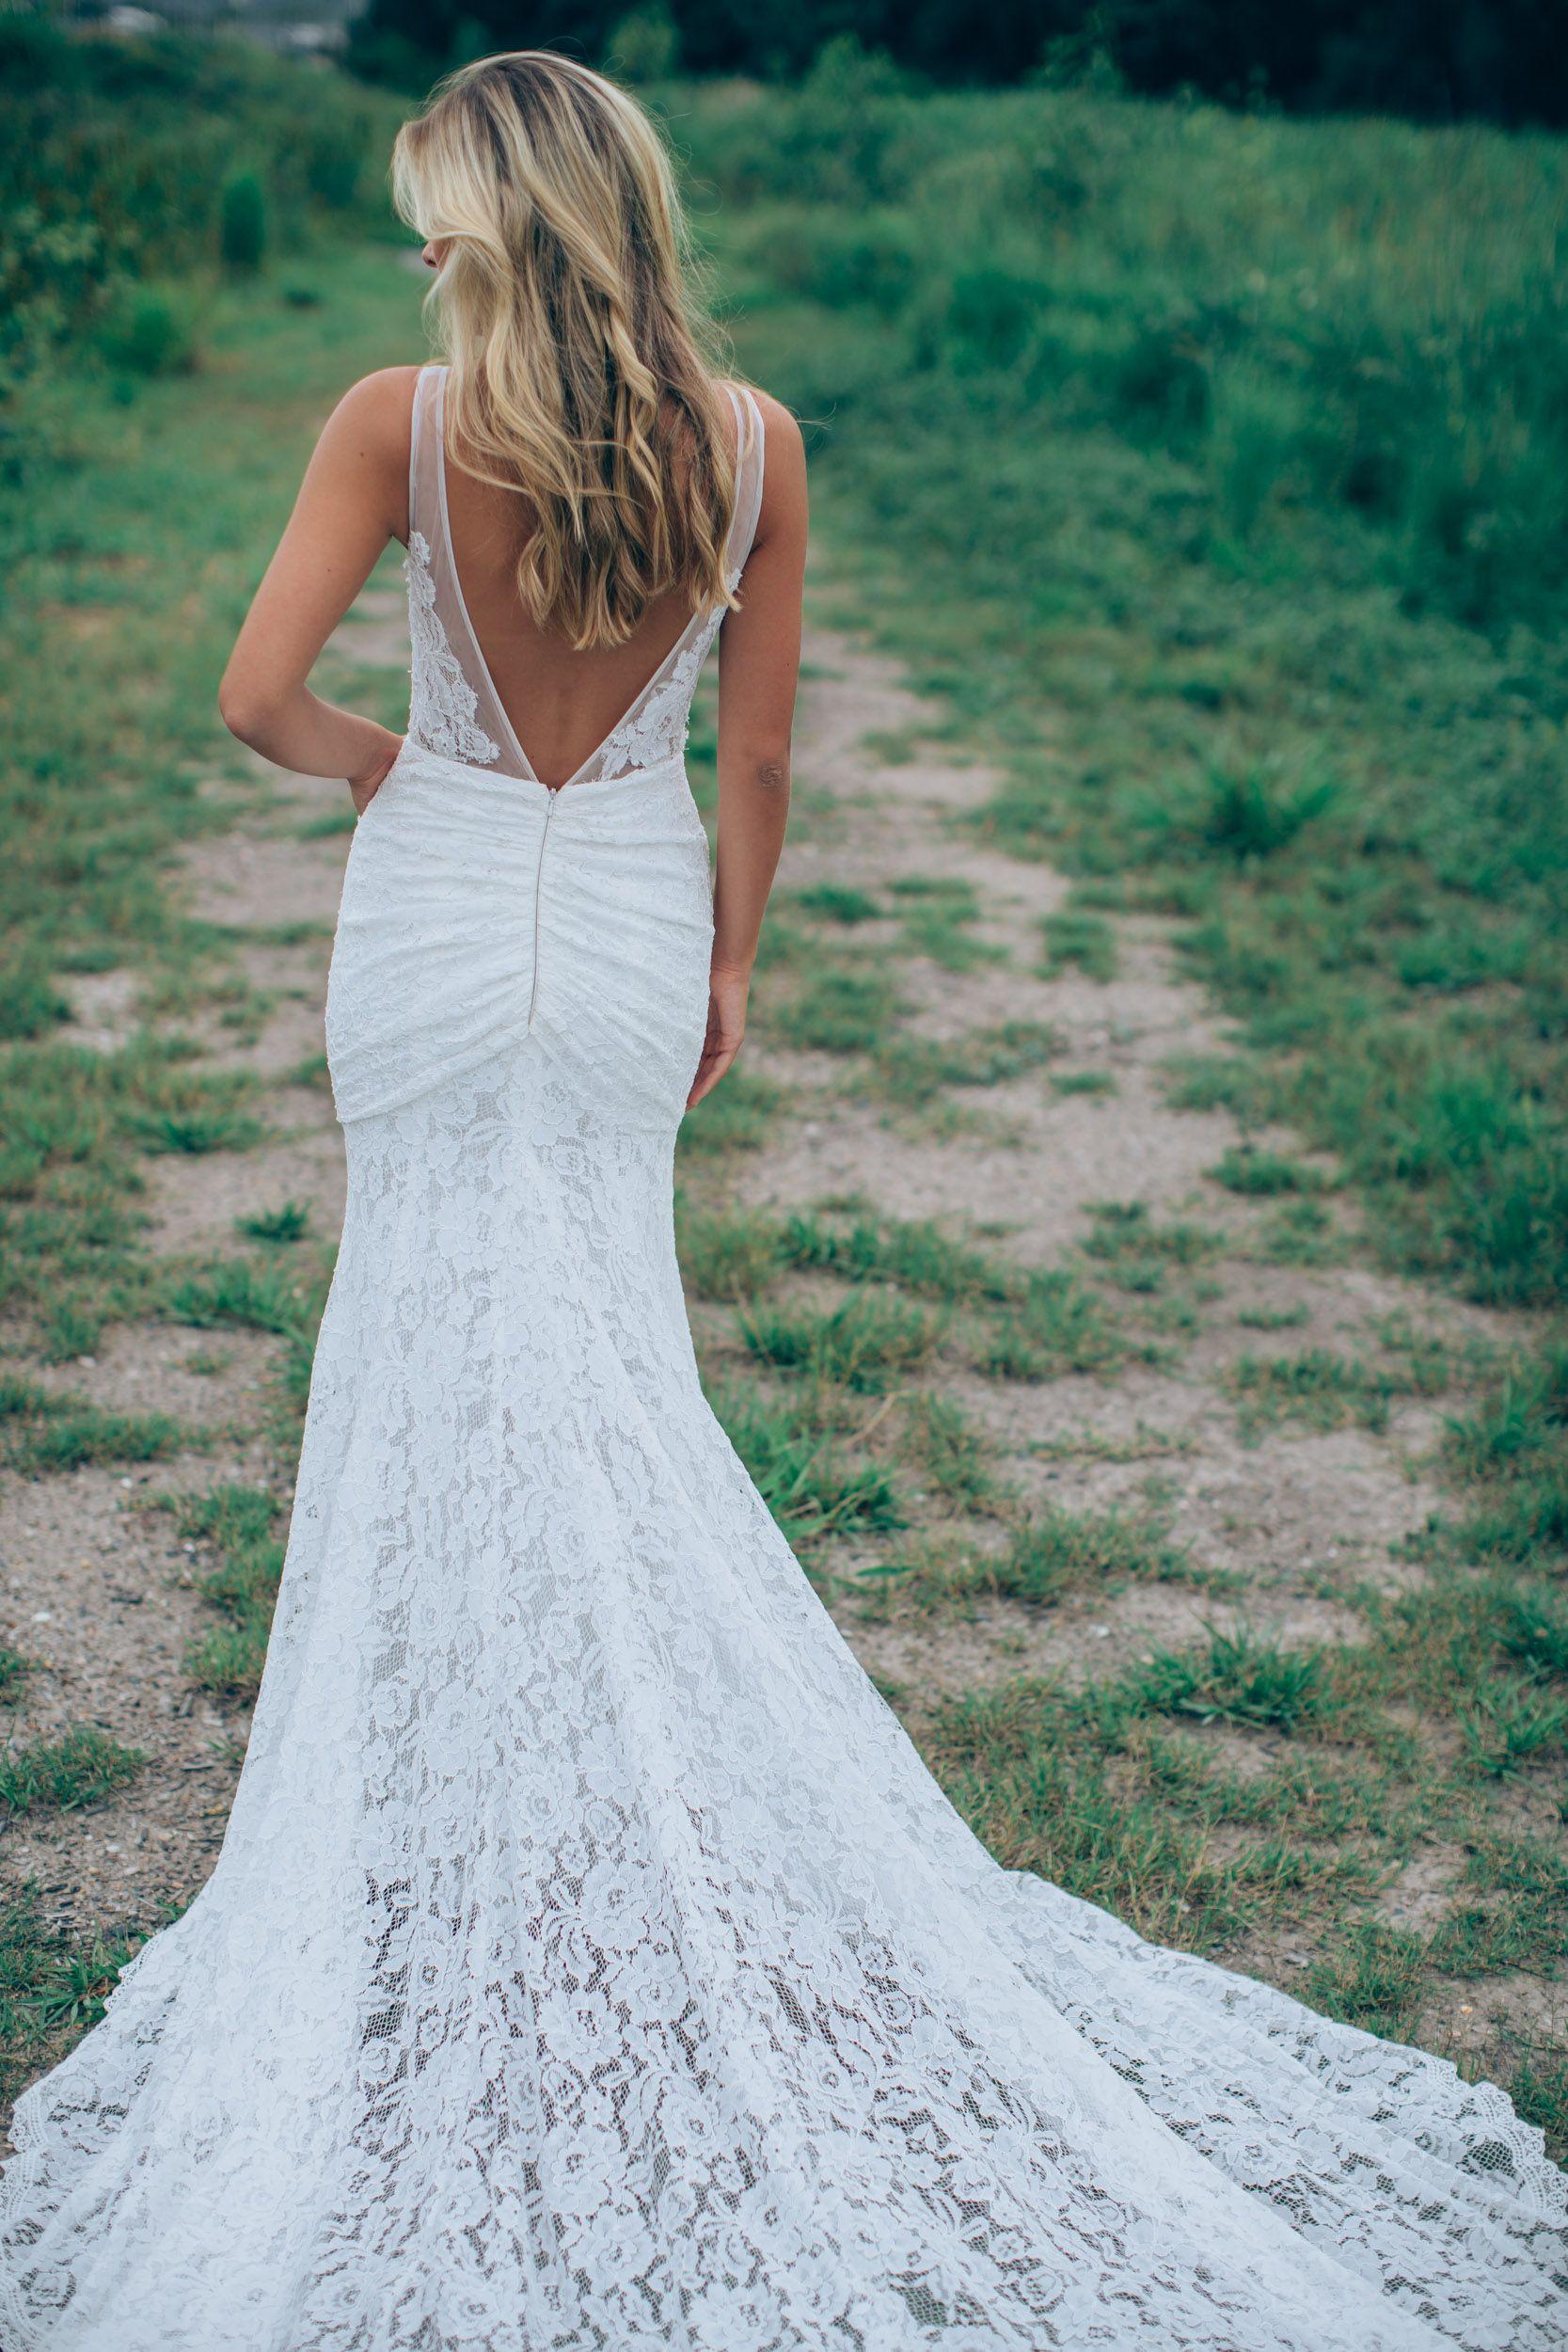 Low back lace wedding dress  Frankie http www madewithlovebridal comLow back lace wedding dress  Frankie http www madewithlovebridal  . Low Back Wedding Dresses Lace. Home Design Ideas